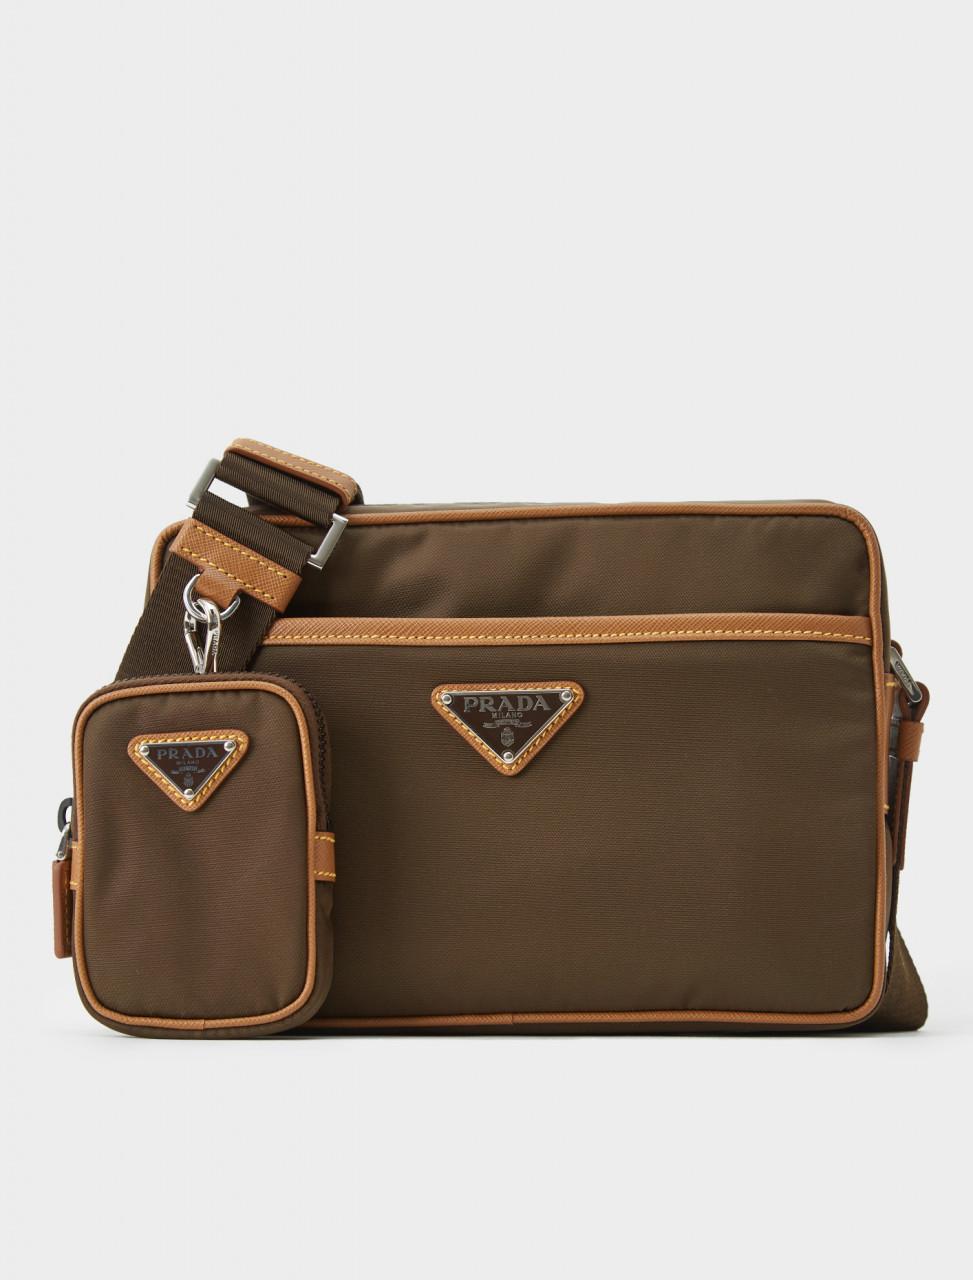 2VH048-064-F0W6K Prada Nylon School Bag with Removable Pouch in Caramel